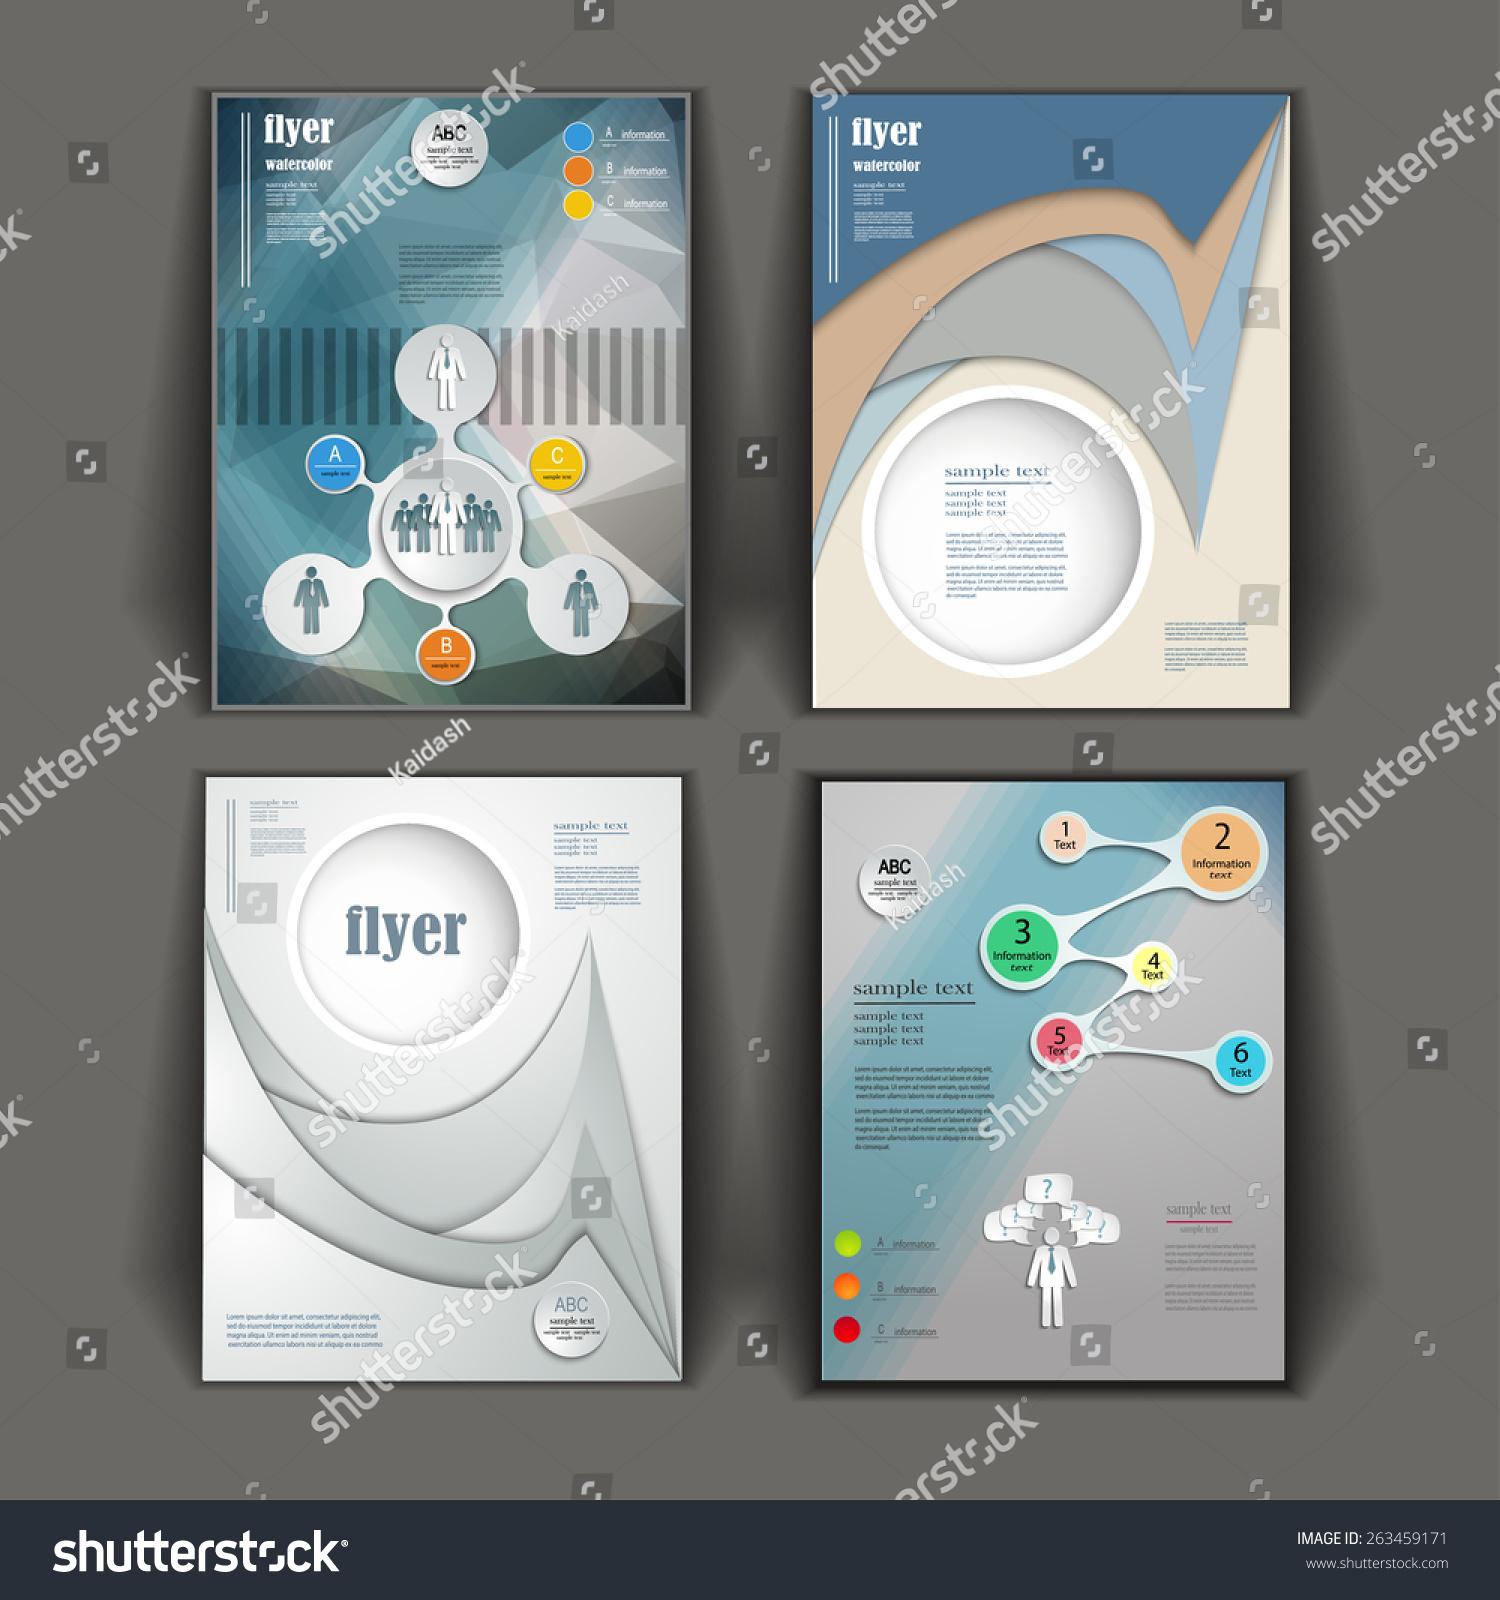 Creative Infographic Presentation Templates Business Brochures Stock ...